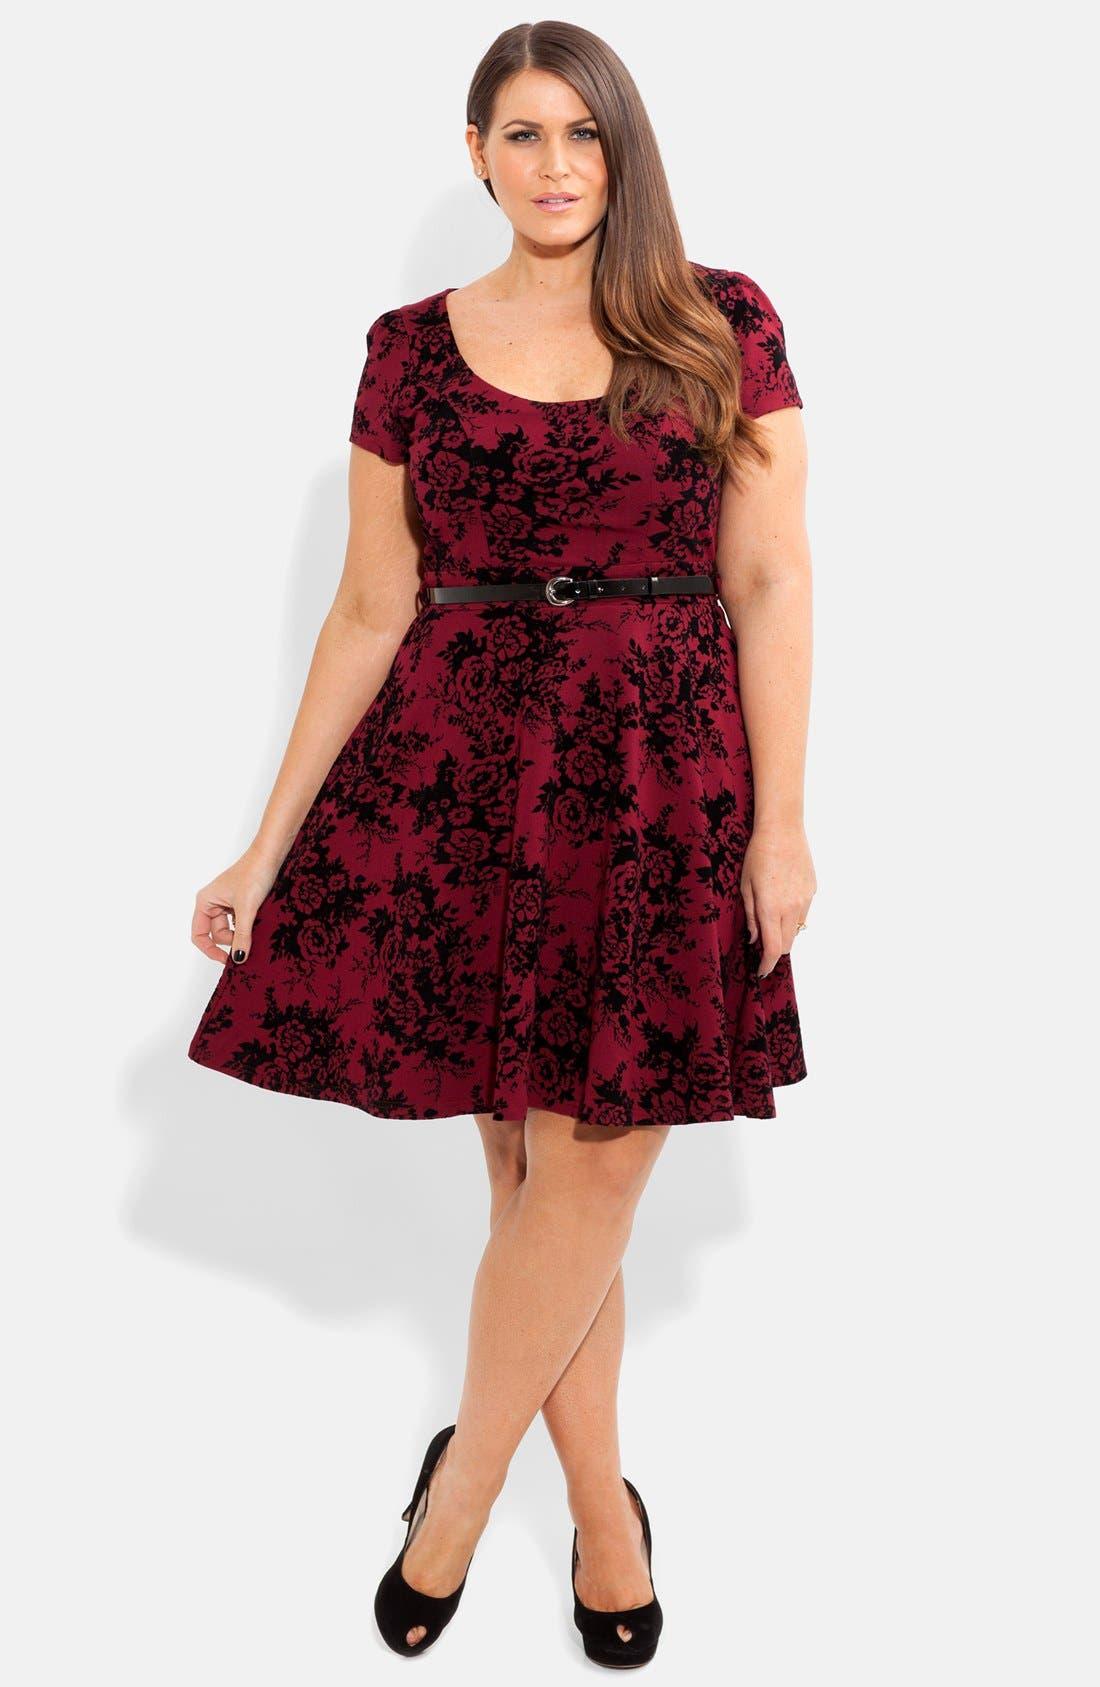 Alternate Image 1 Selected - City Chic Floral Print Skater Dress (Plus Size)